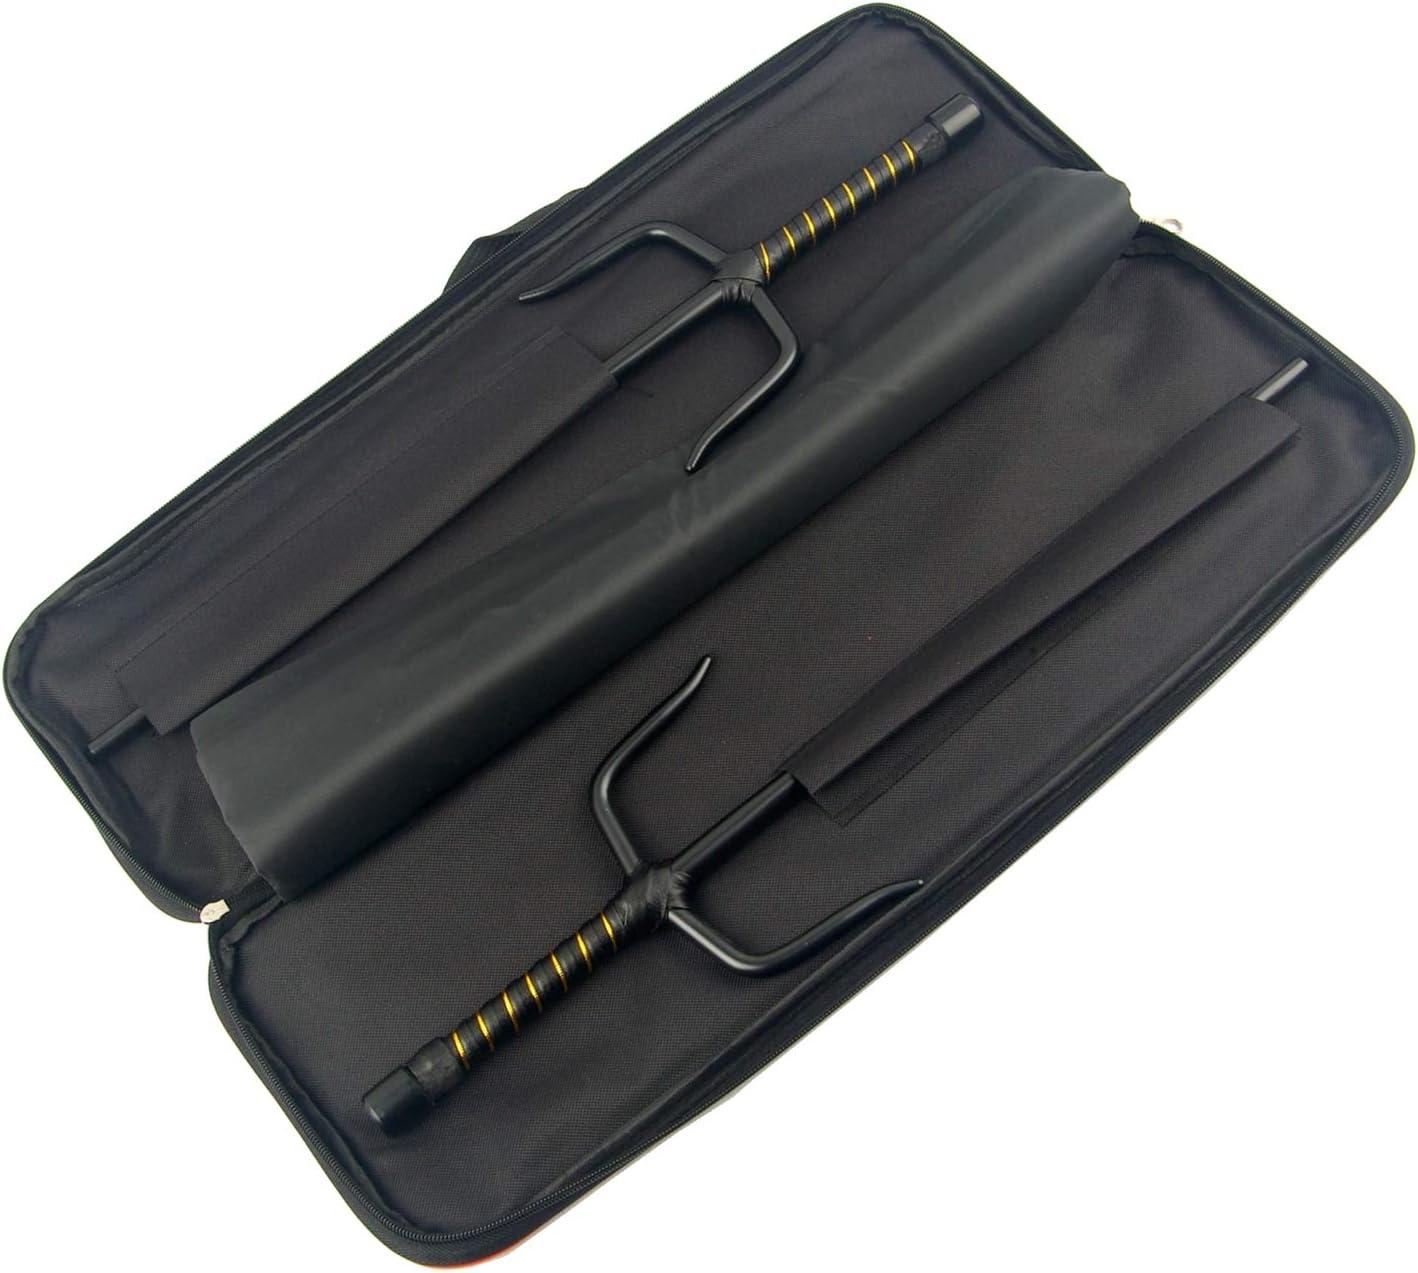 Superdo Cylinder Metal Martial Arts Sai /& Case Black, 21\